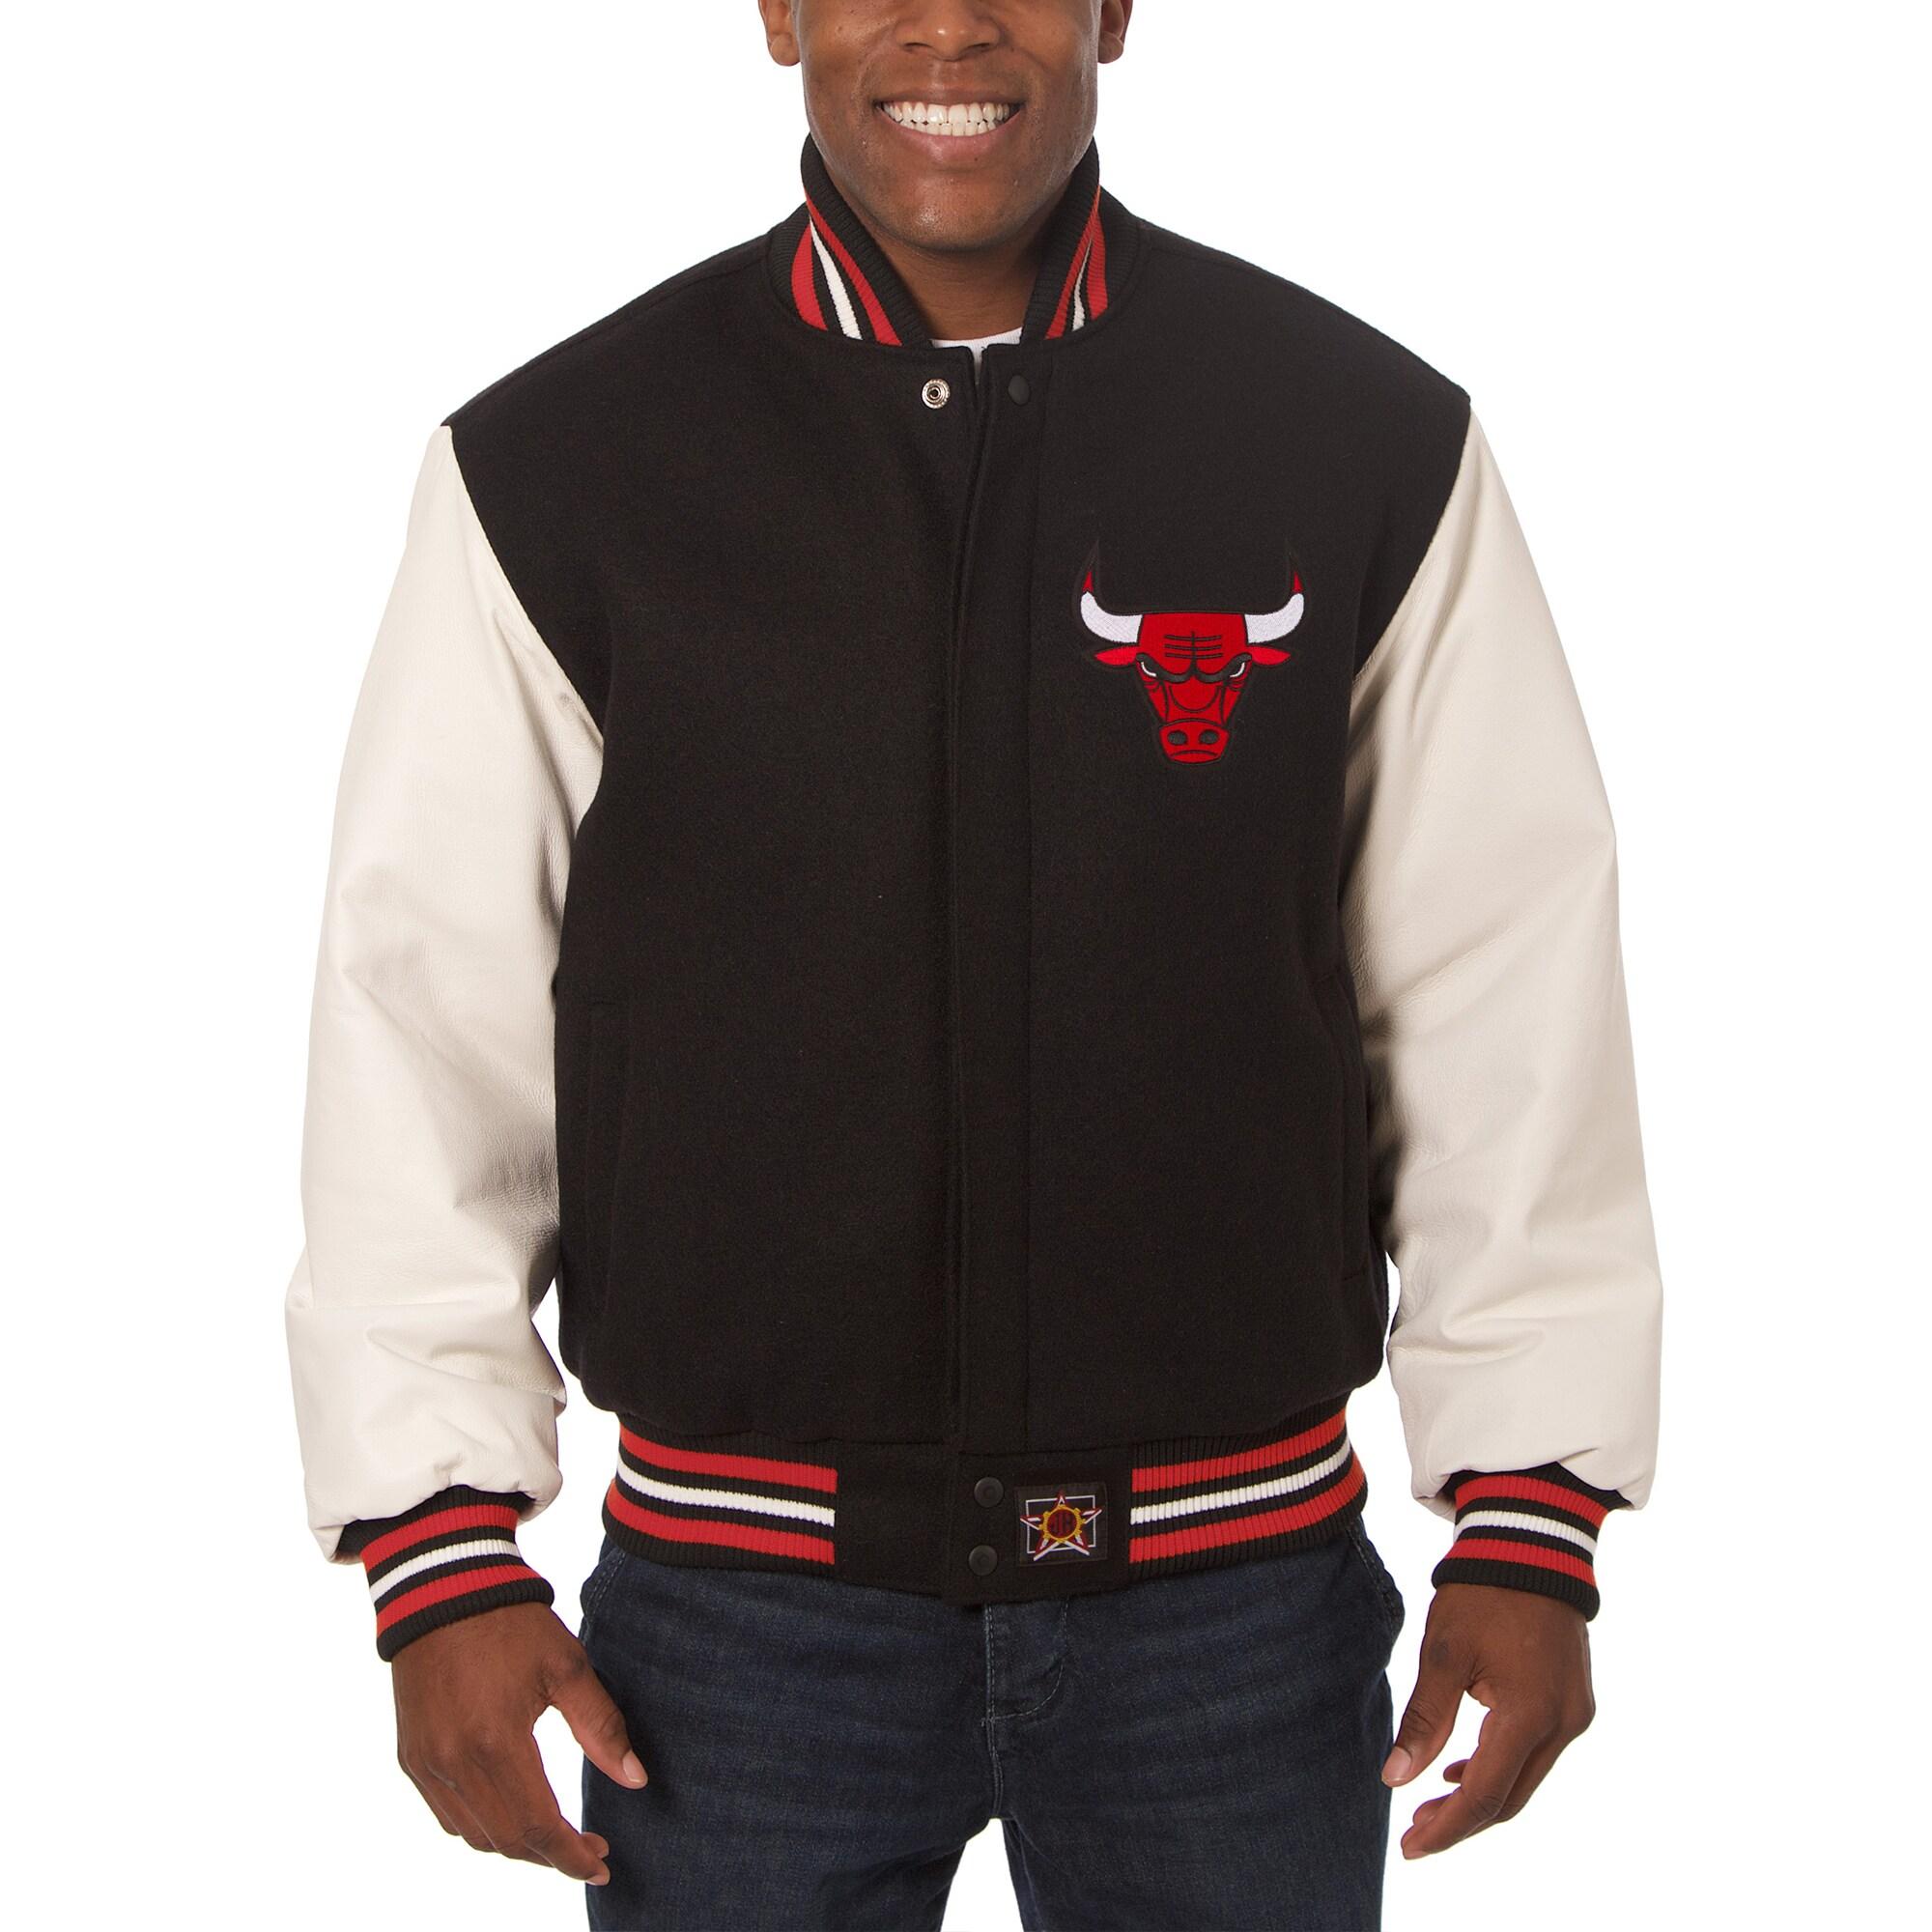 Chicago Bulls JH Design Big & Tall Wool & Leather Jacket - Black/White